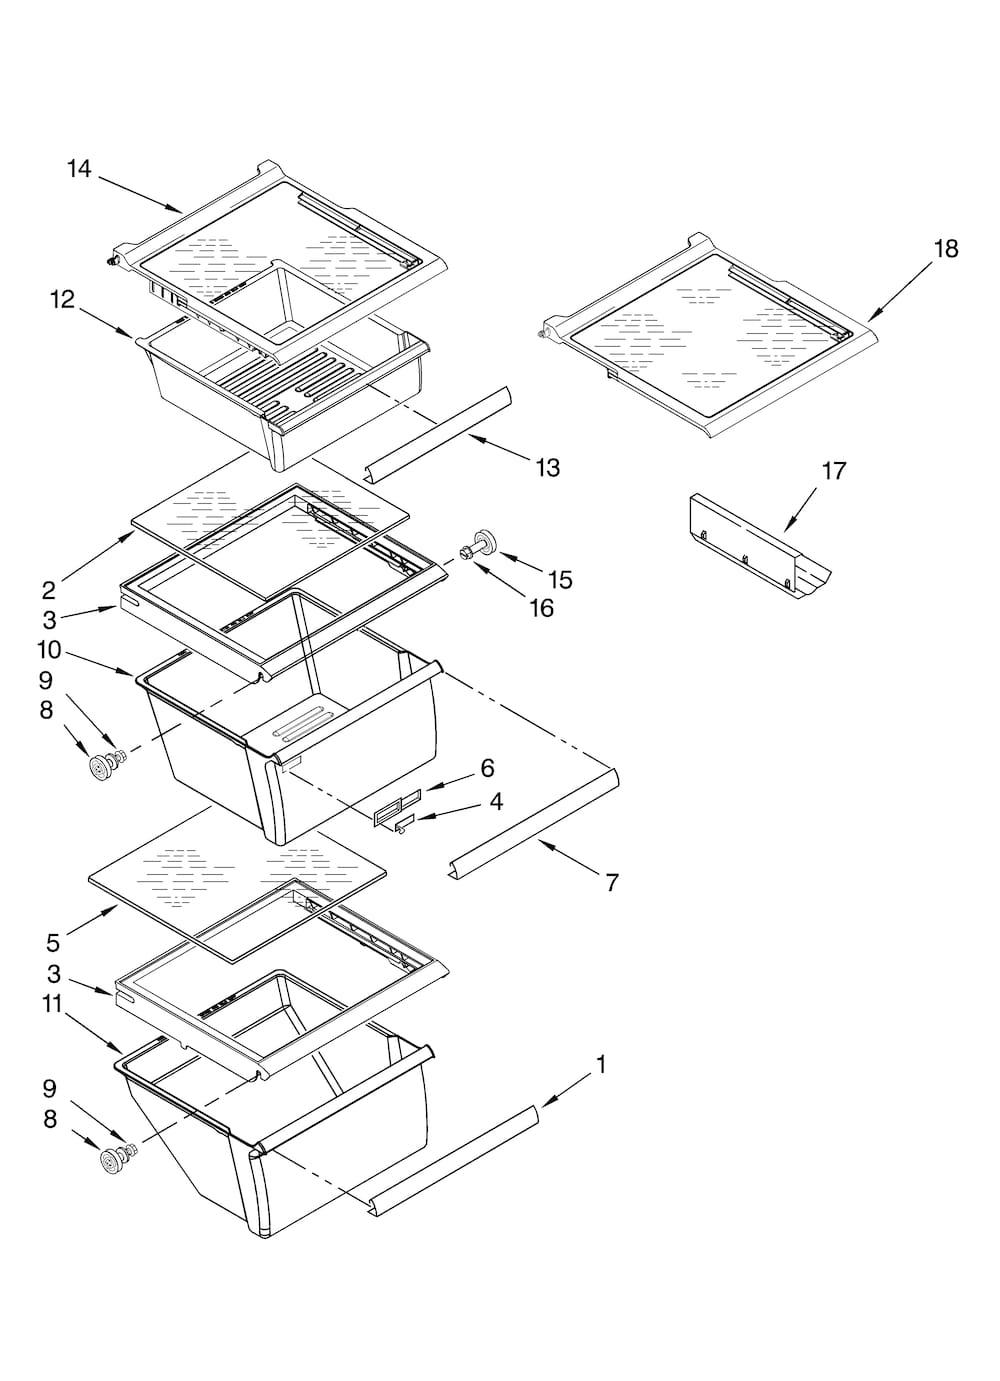 Kenmore 106.59422800 Shelf Frame with Gl (crisper cover) - Genuine on